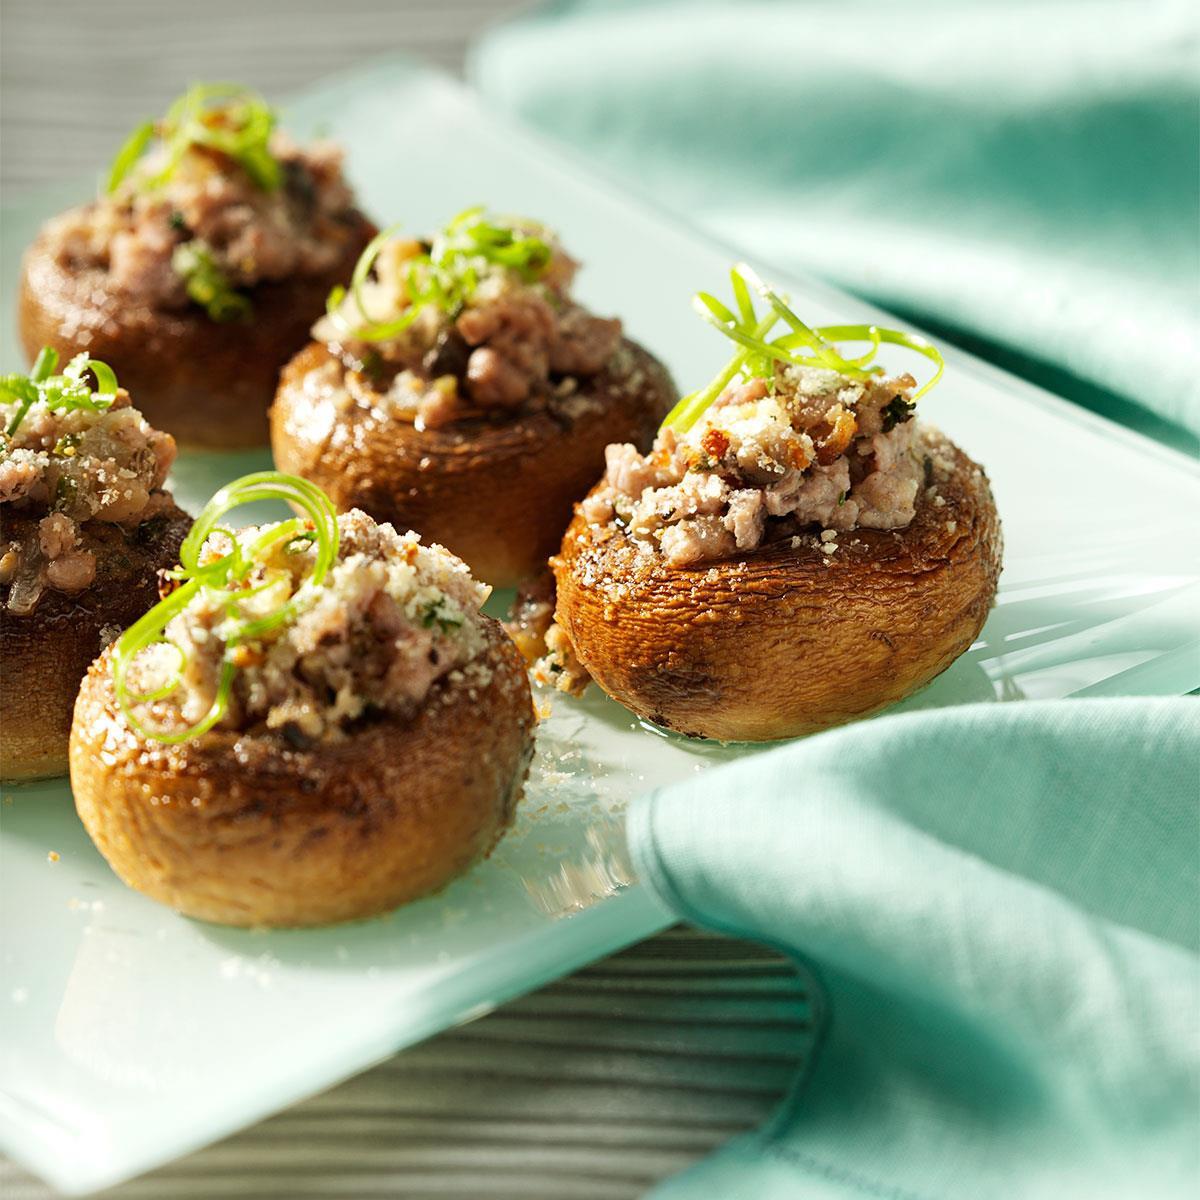 Stuffed Mushroom Appetizer Recipes  stuffed mushroom appetizer